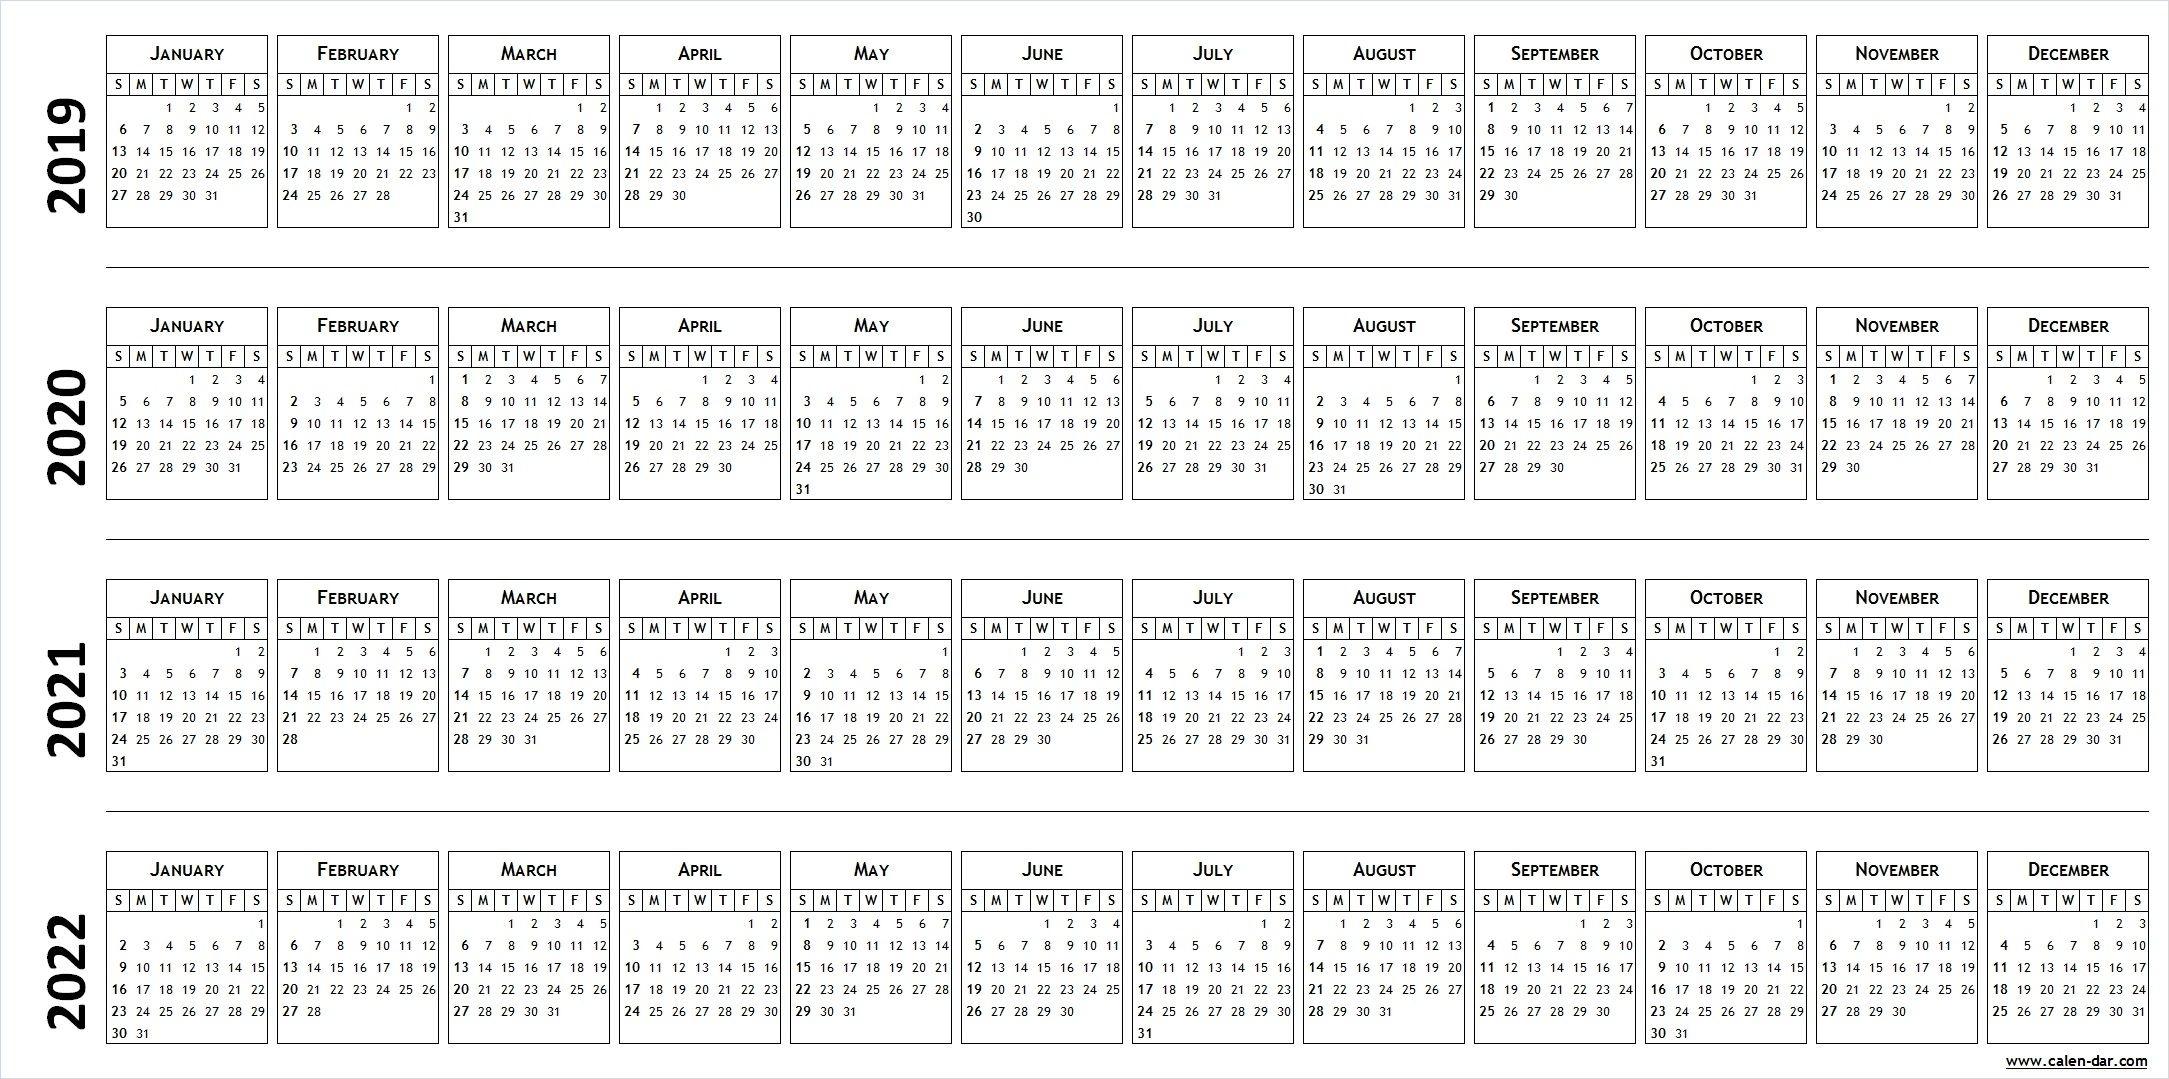 Blank Template For Calendar 2019 2020 2021 2022 | Calendar